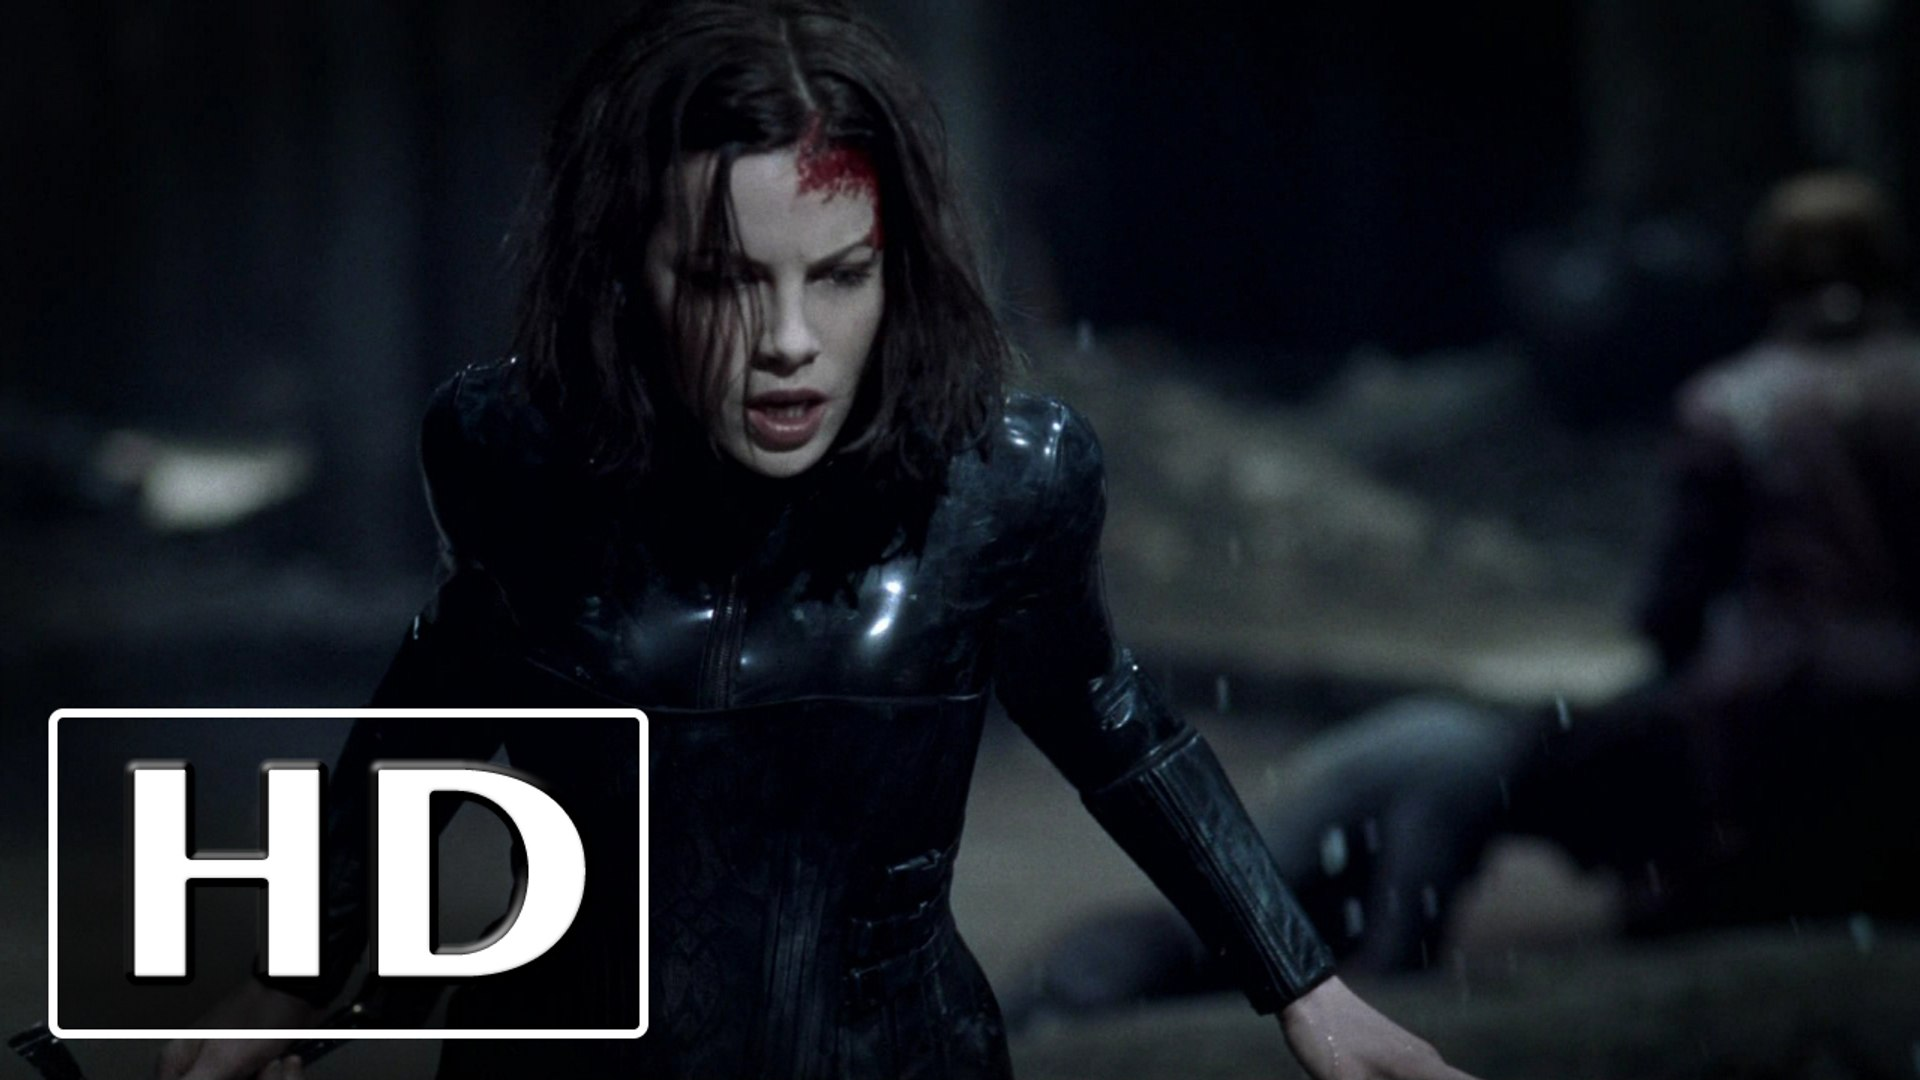 Underworld Blood [Wars] 2017 Film En Entier Streaming Entièrement en Français redirected to your mov